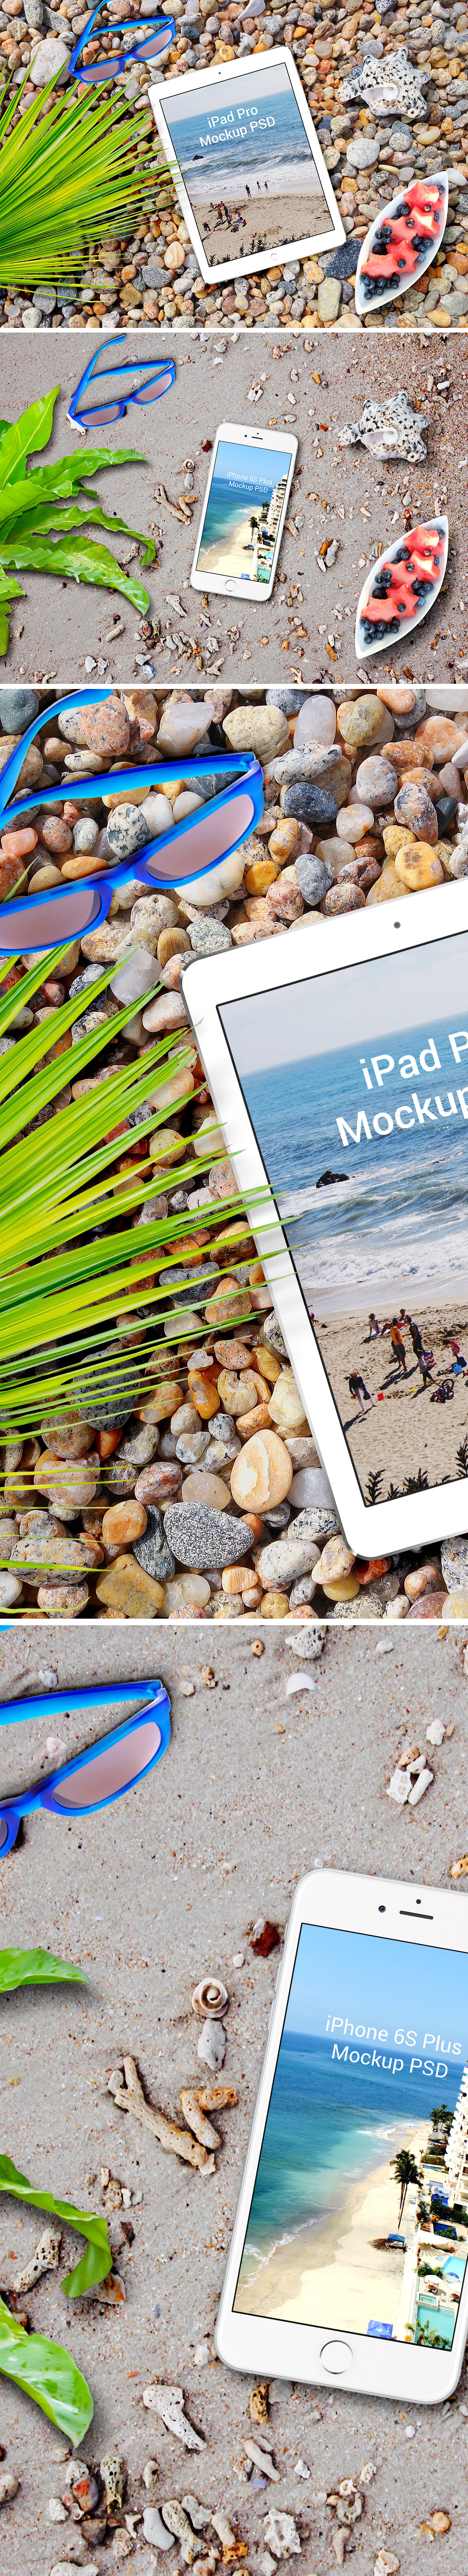 Apple Devices Plus Beach Scene